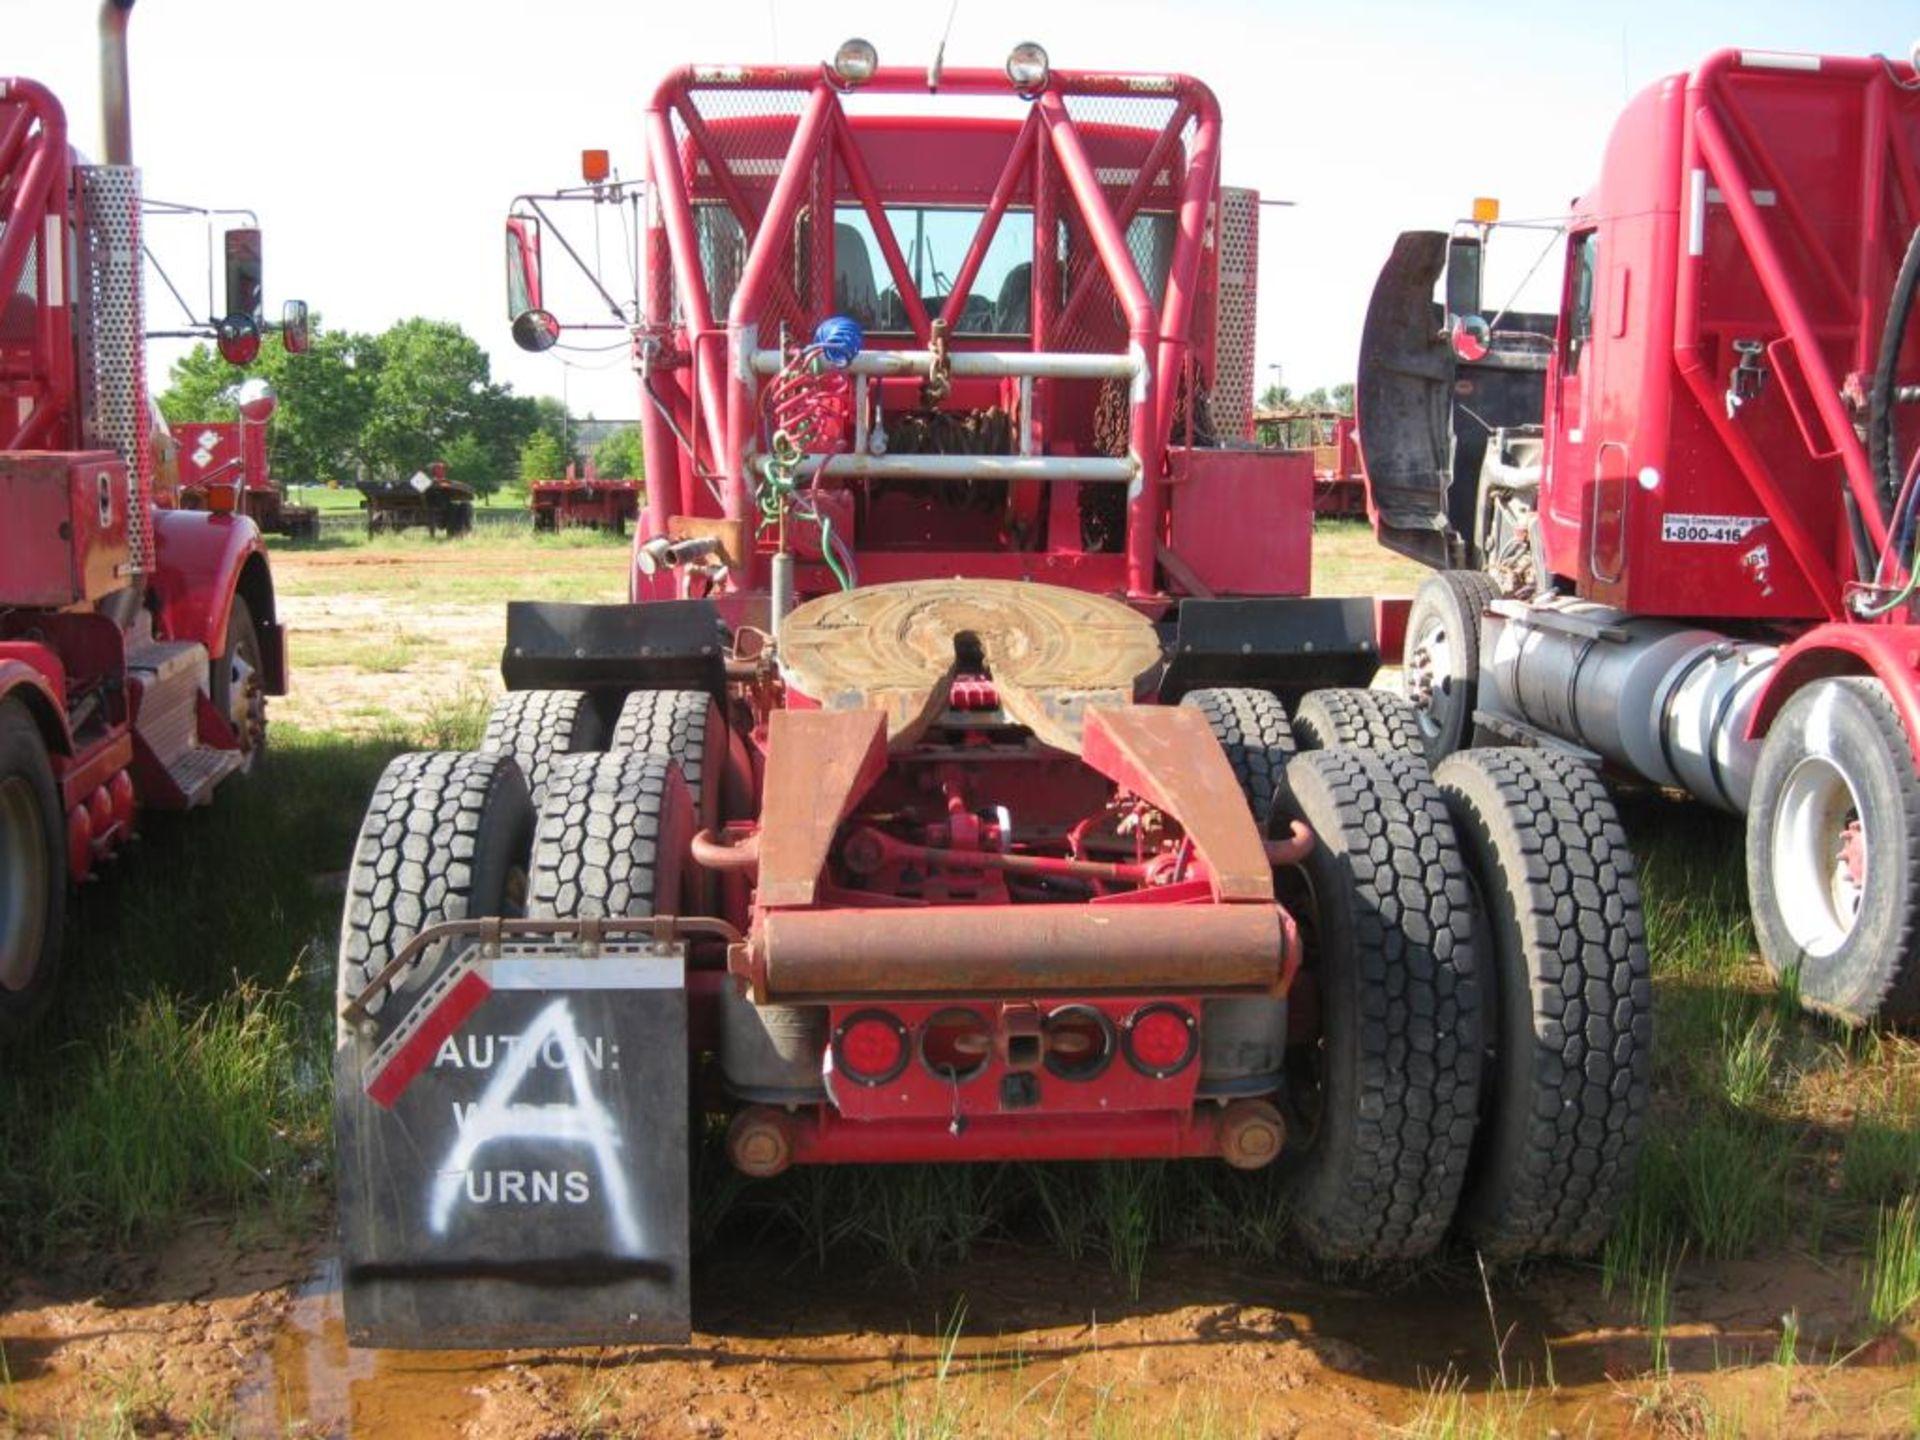 Kenworth Winch Truck - Image 8 of 27